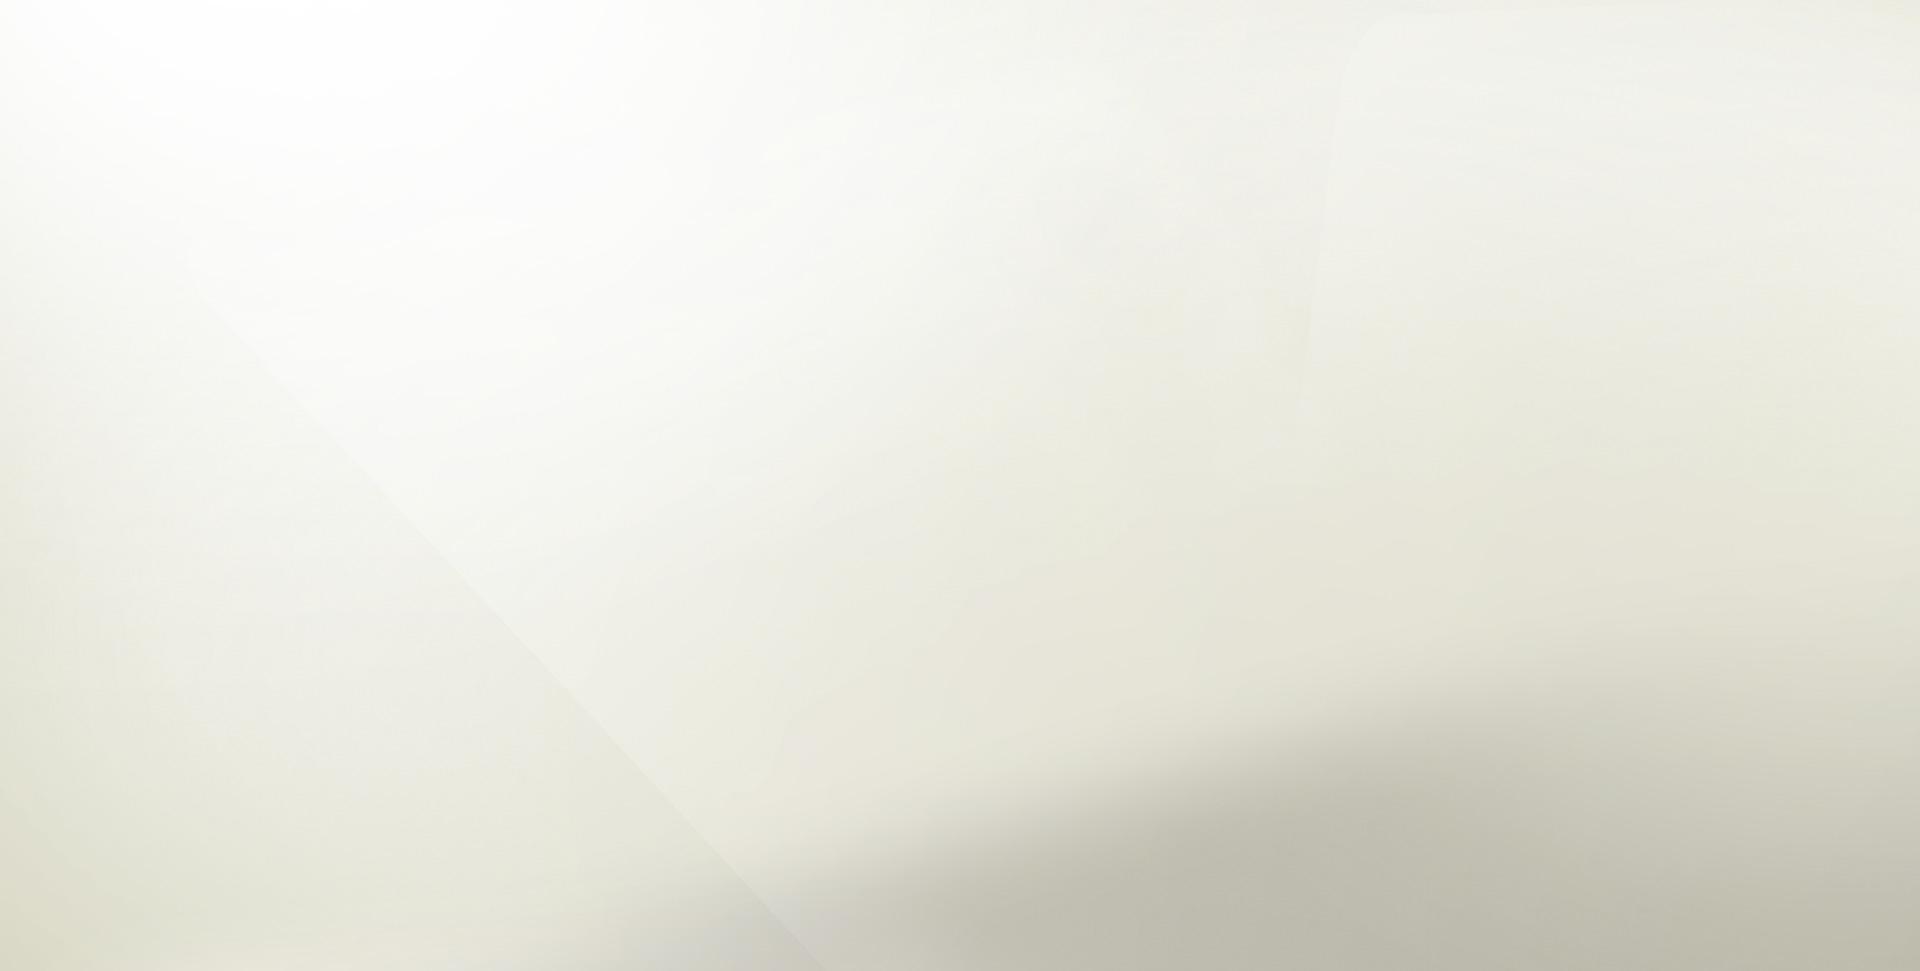 Asus Transformer Book Flip Tp200sa 2 In 1 Pcs Usa A3f Laptop Block Diagram